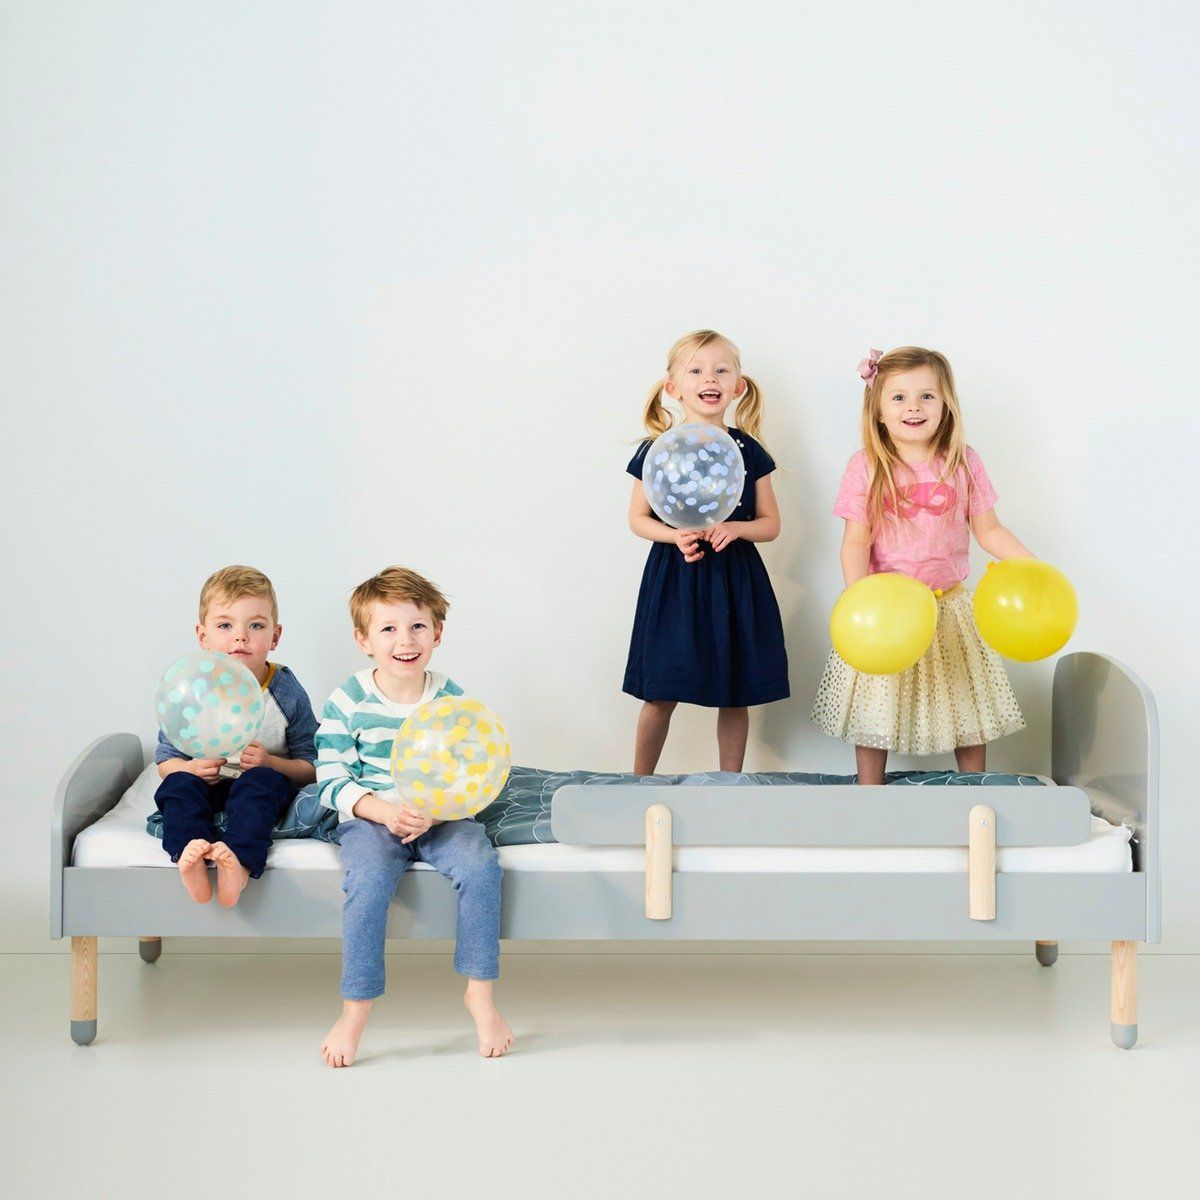 Flexa Kinderbett PLAY aus Holz (90x200) in grau, TÜV